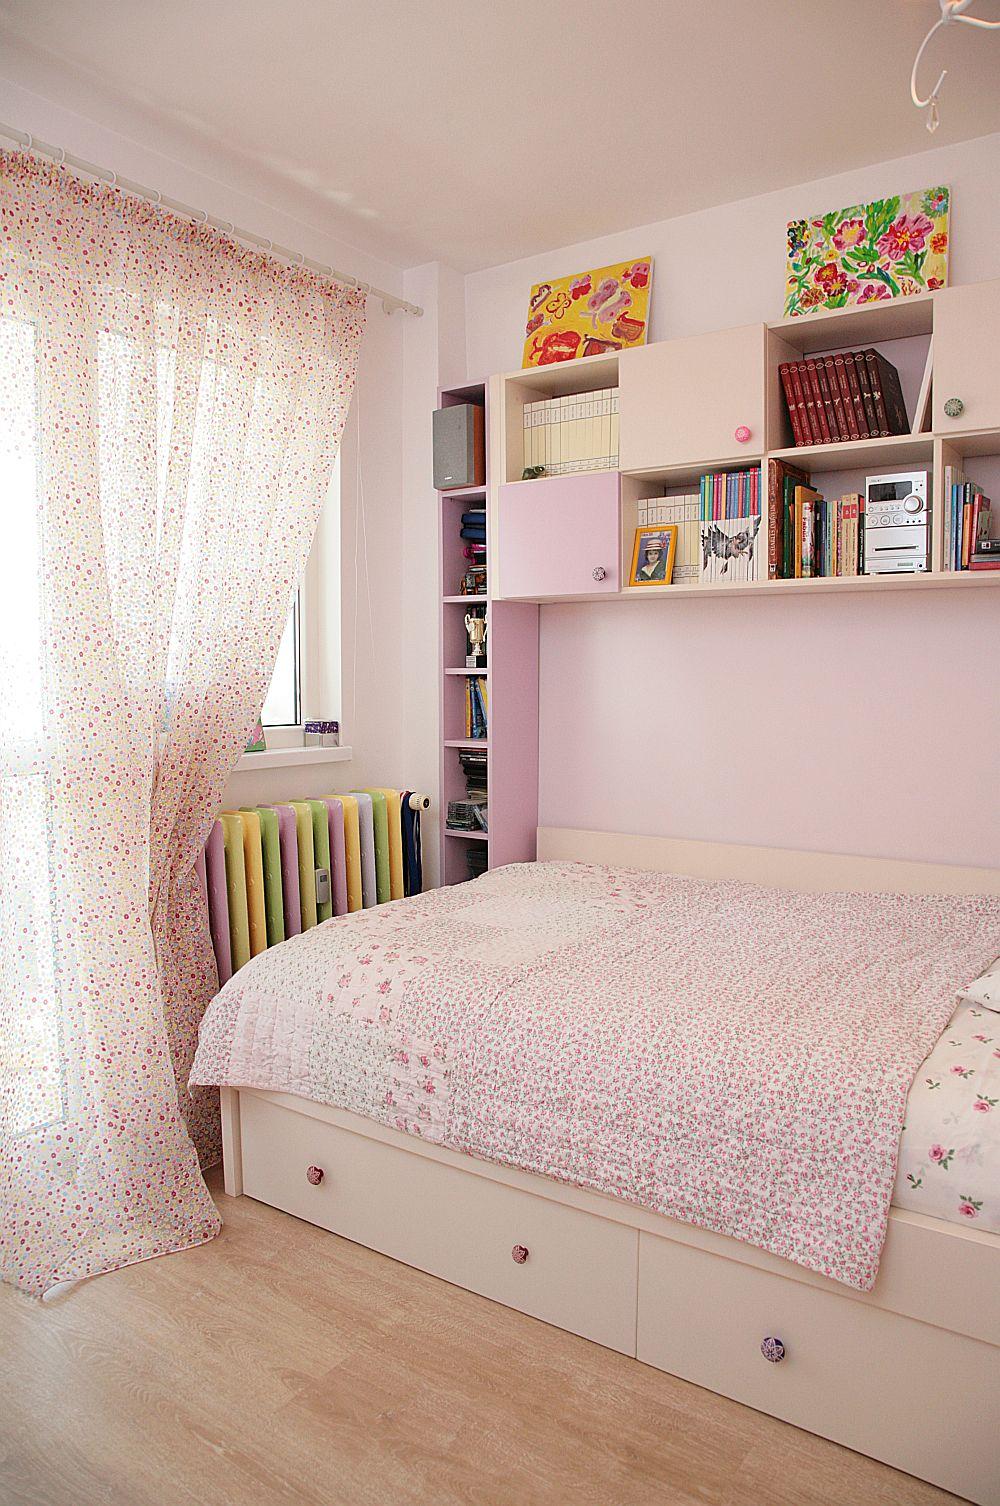 adelaparvu.com despre amenajare apartament Bucuresti, design interior Alia Bakutayan si Daniel Tufis - Valdecor (9)